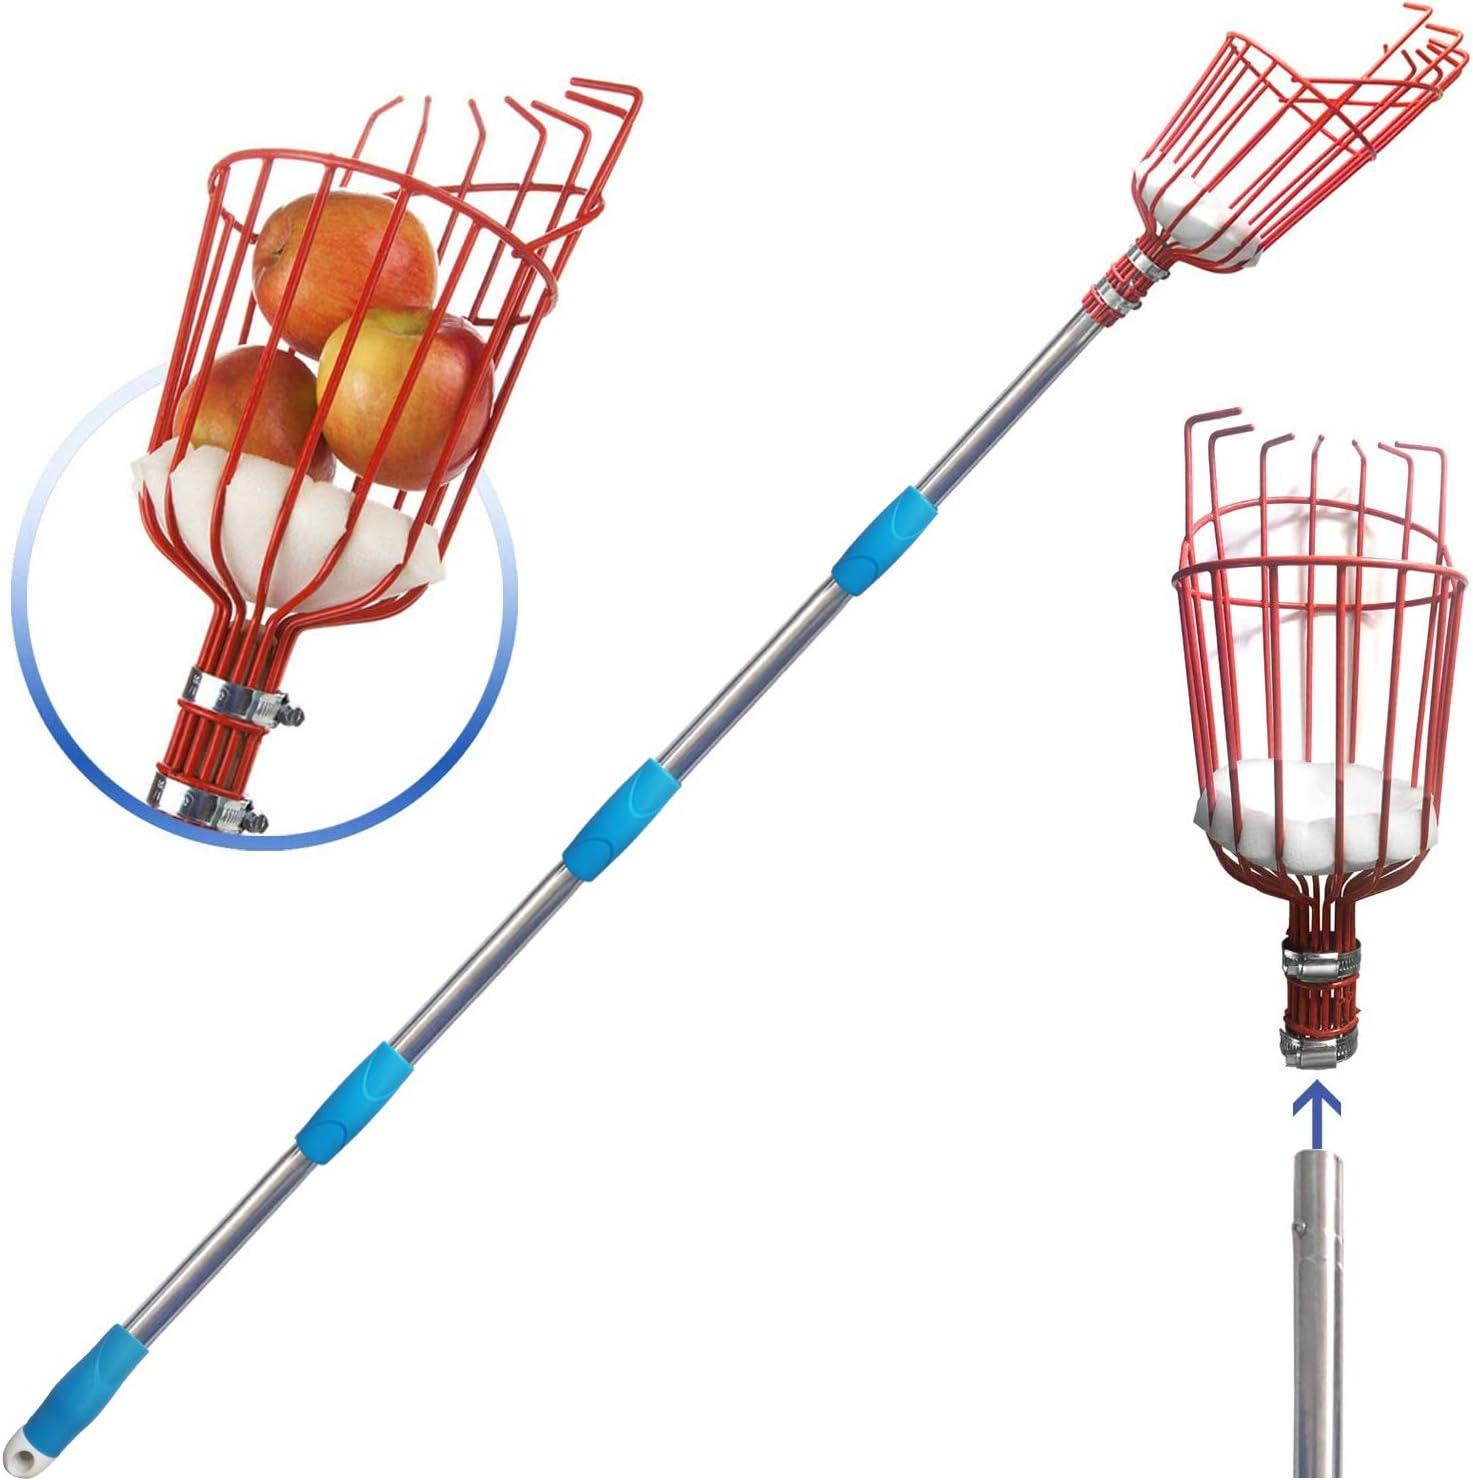 COCONUT Fruit Picker Tool, Fruit Picker Pole with Basket Height Adjustable - 13FT Mango Lemon Orange Apple Picker - Fruits Catcher Tree Picker for Getting Fruits